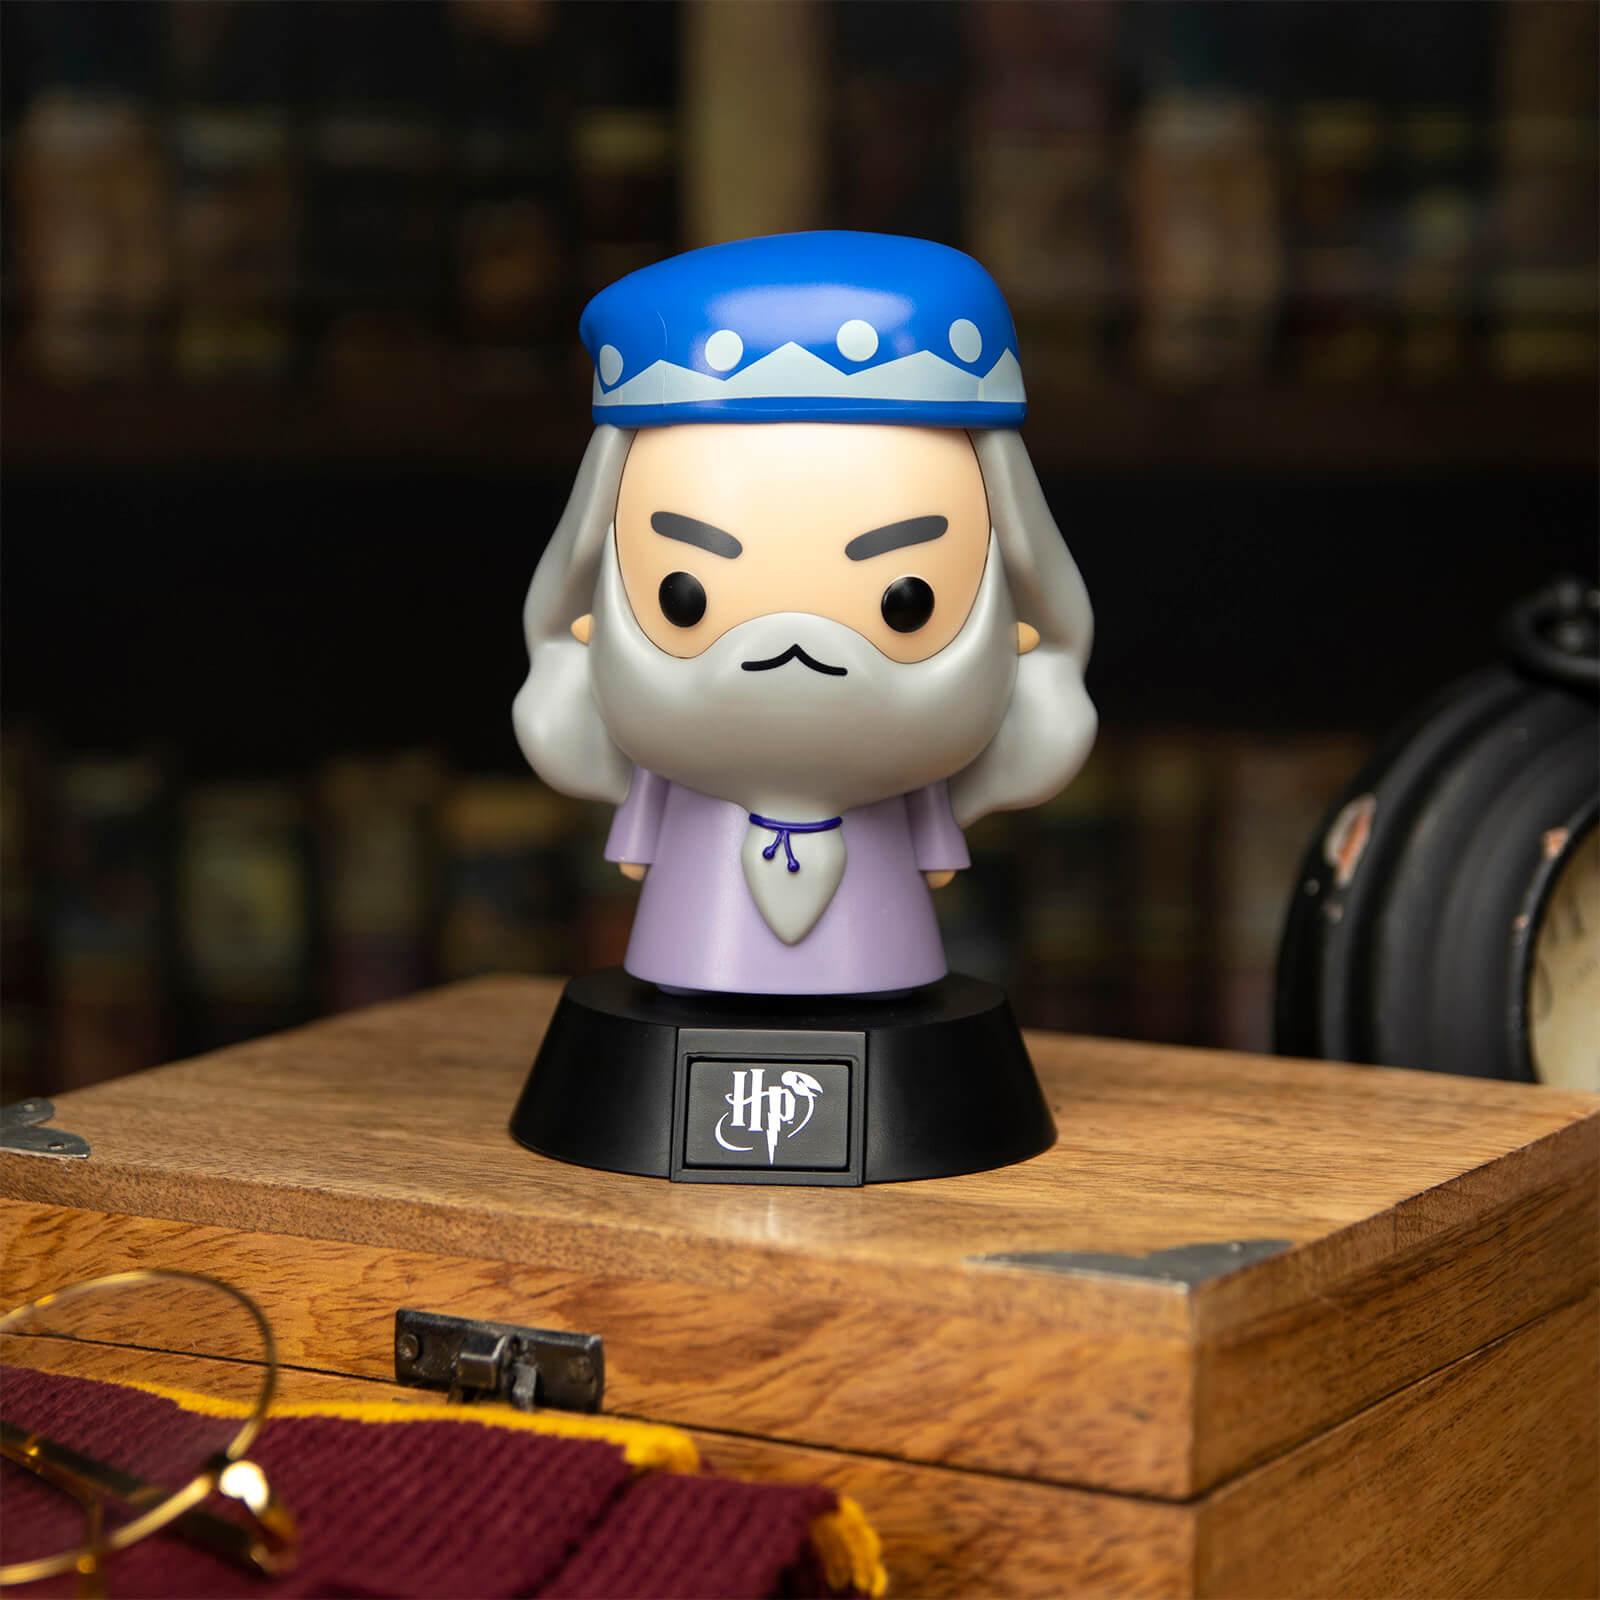 Lampara paladone icon harry potter albus dumbledore